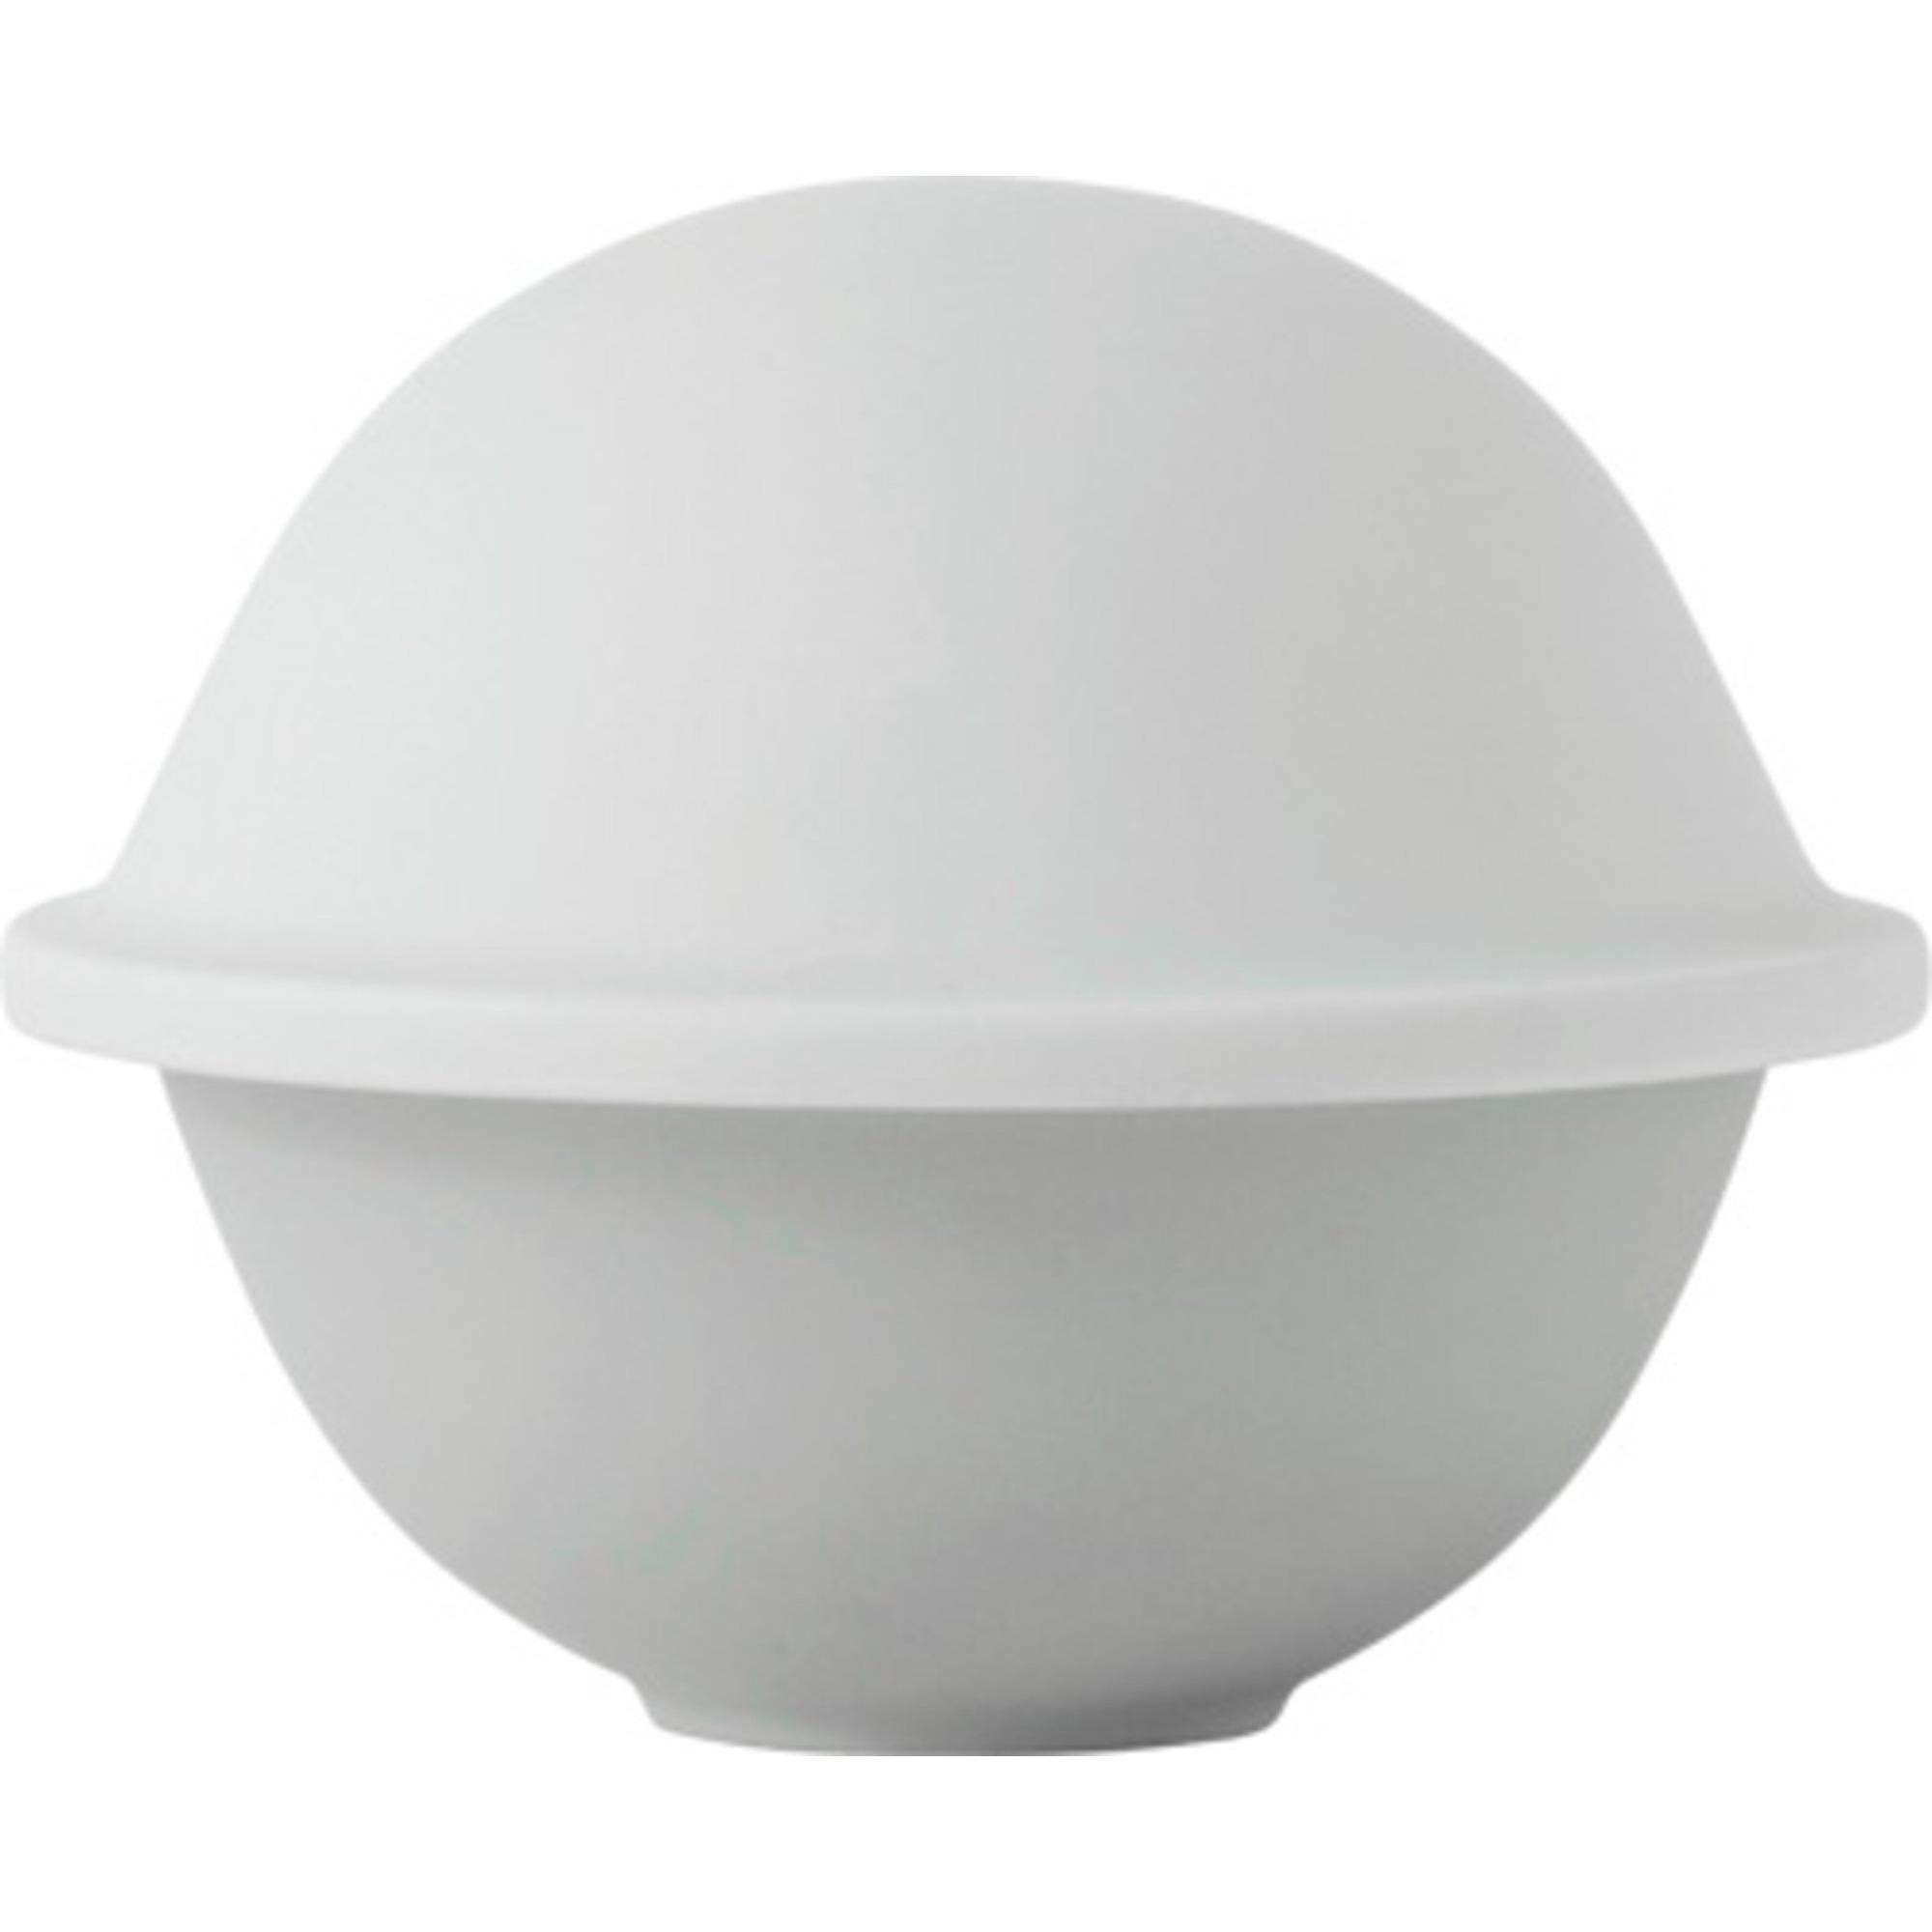 Lyngby Porcelæn Chapeau liten matt vit